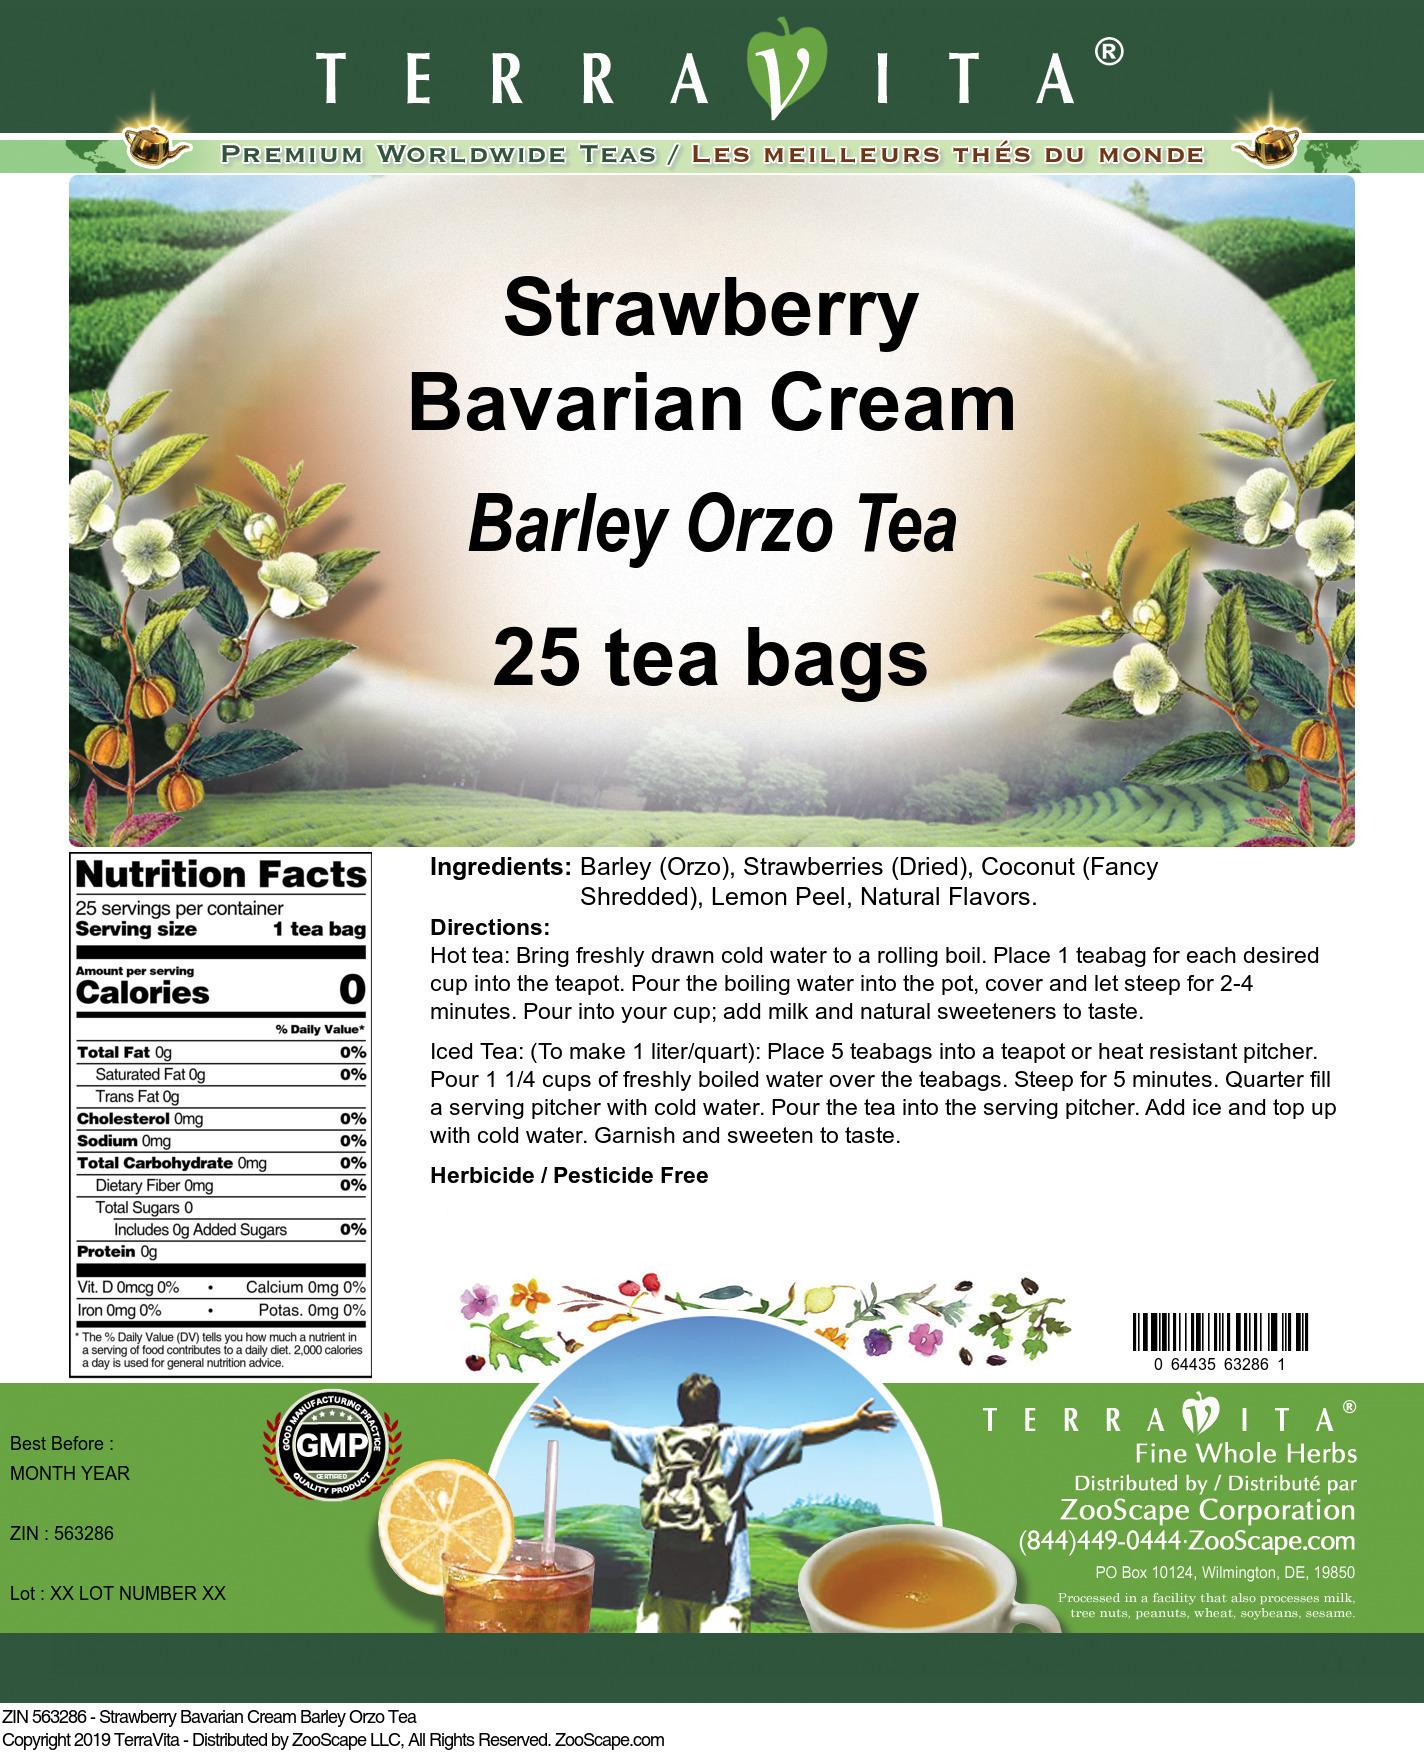 Strawberry Bavarian Cream Barley Orzo Tea